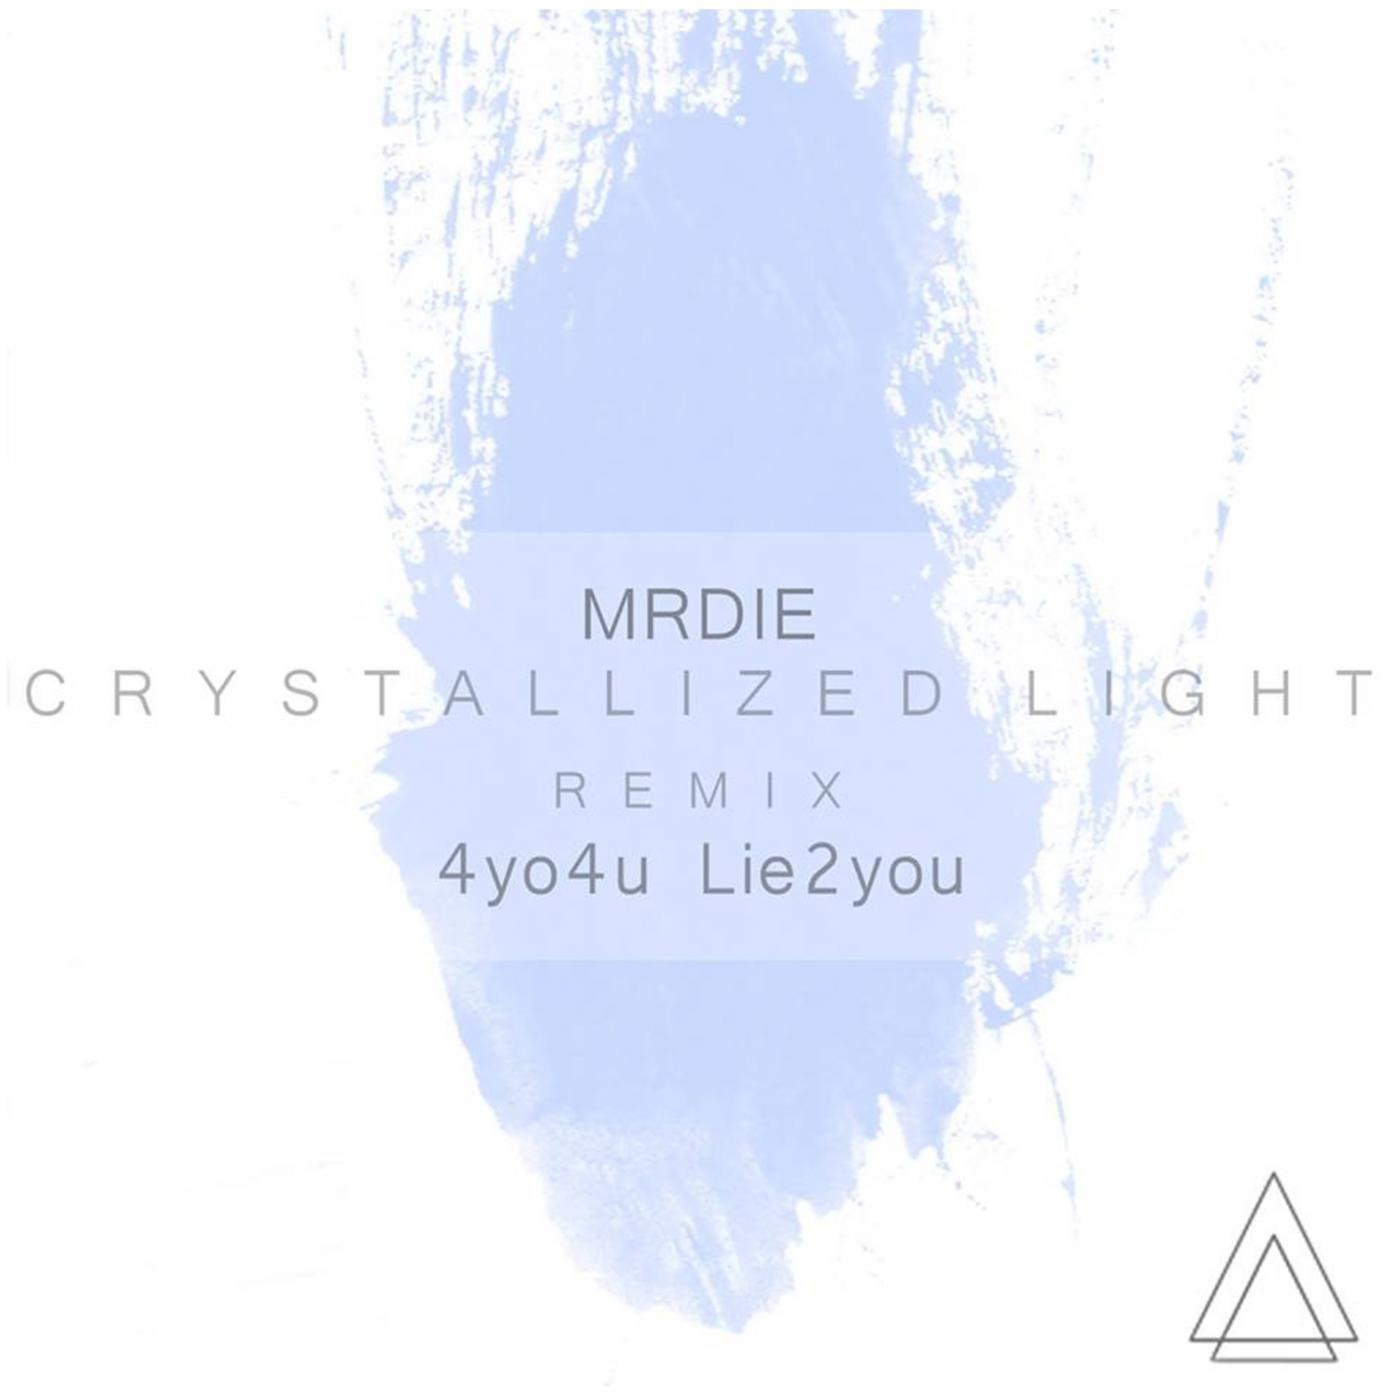 MRDIE - Warm Crystallized Light (Original mix)